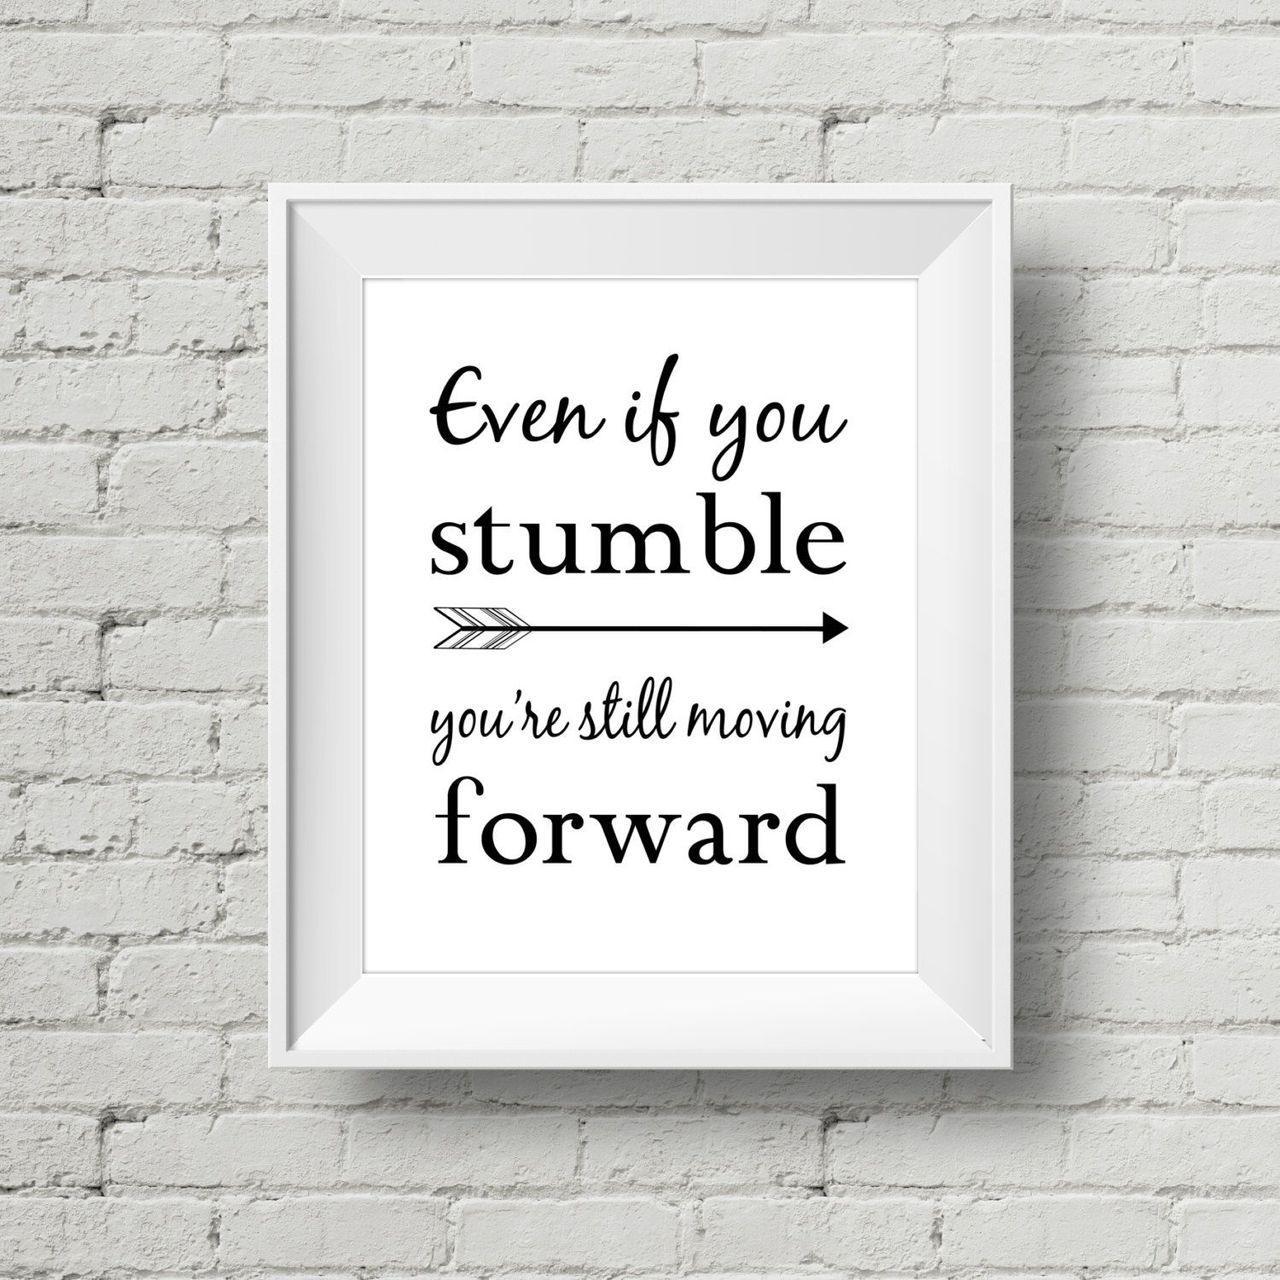 Even if you stumble